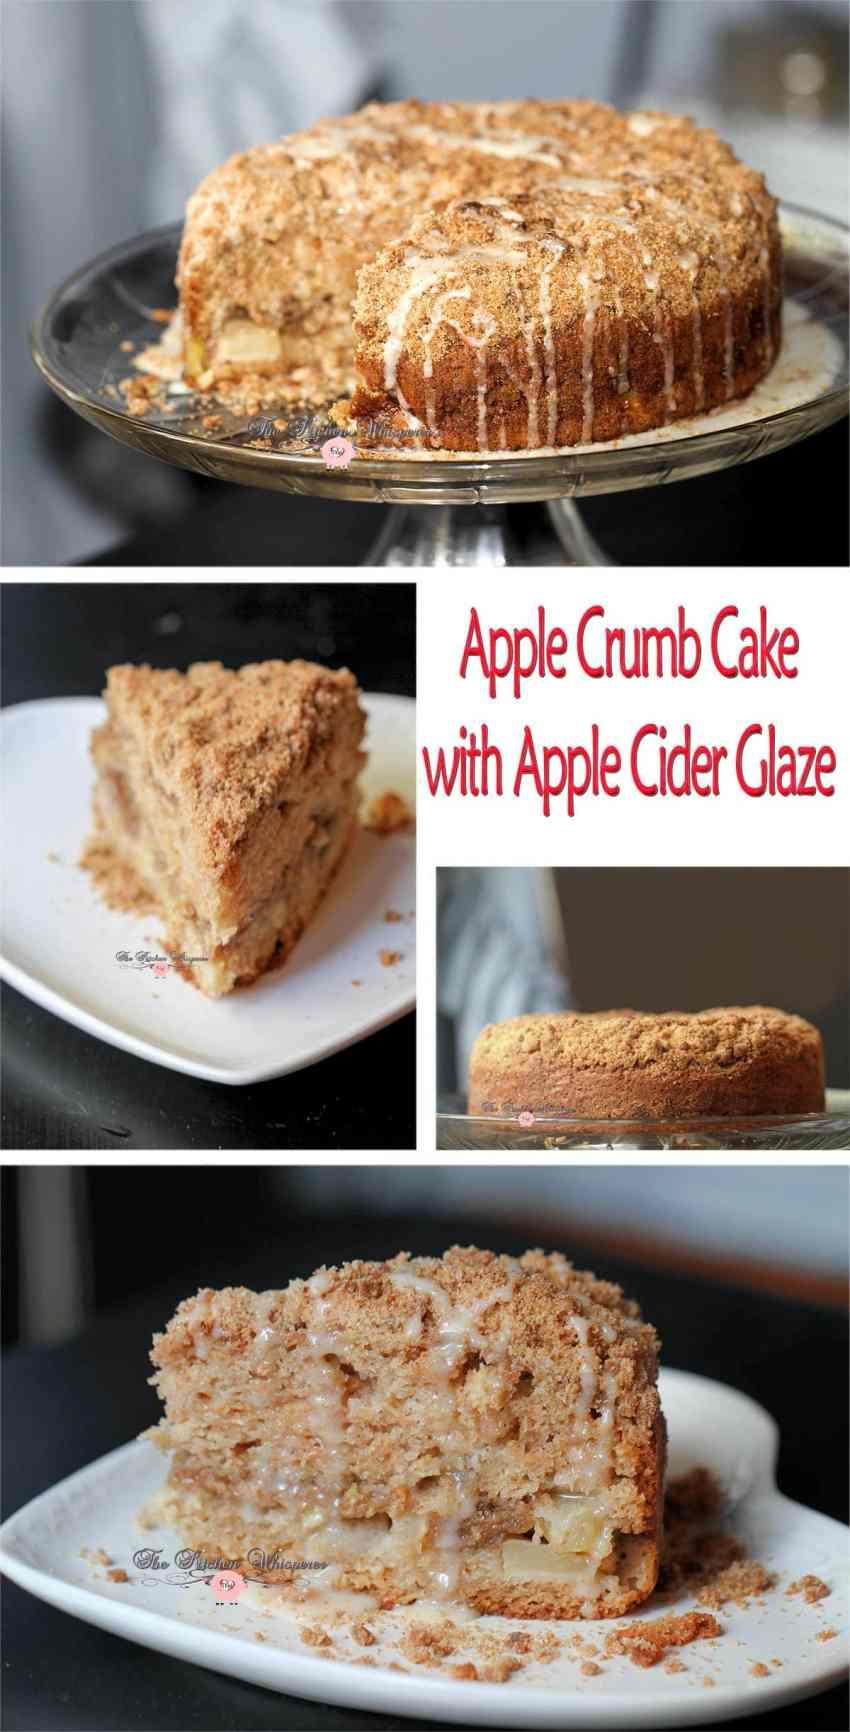 Apple Crumb Cake Collage